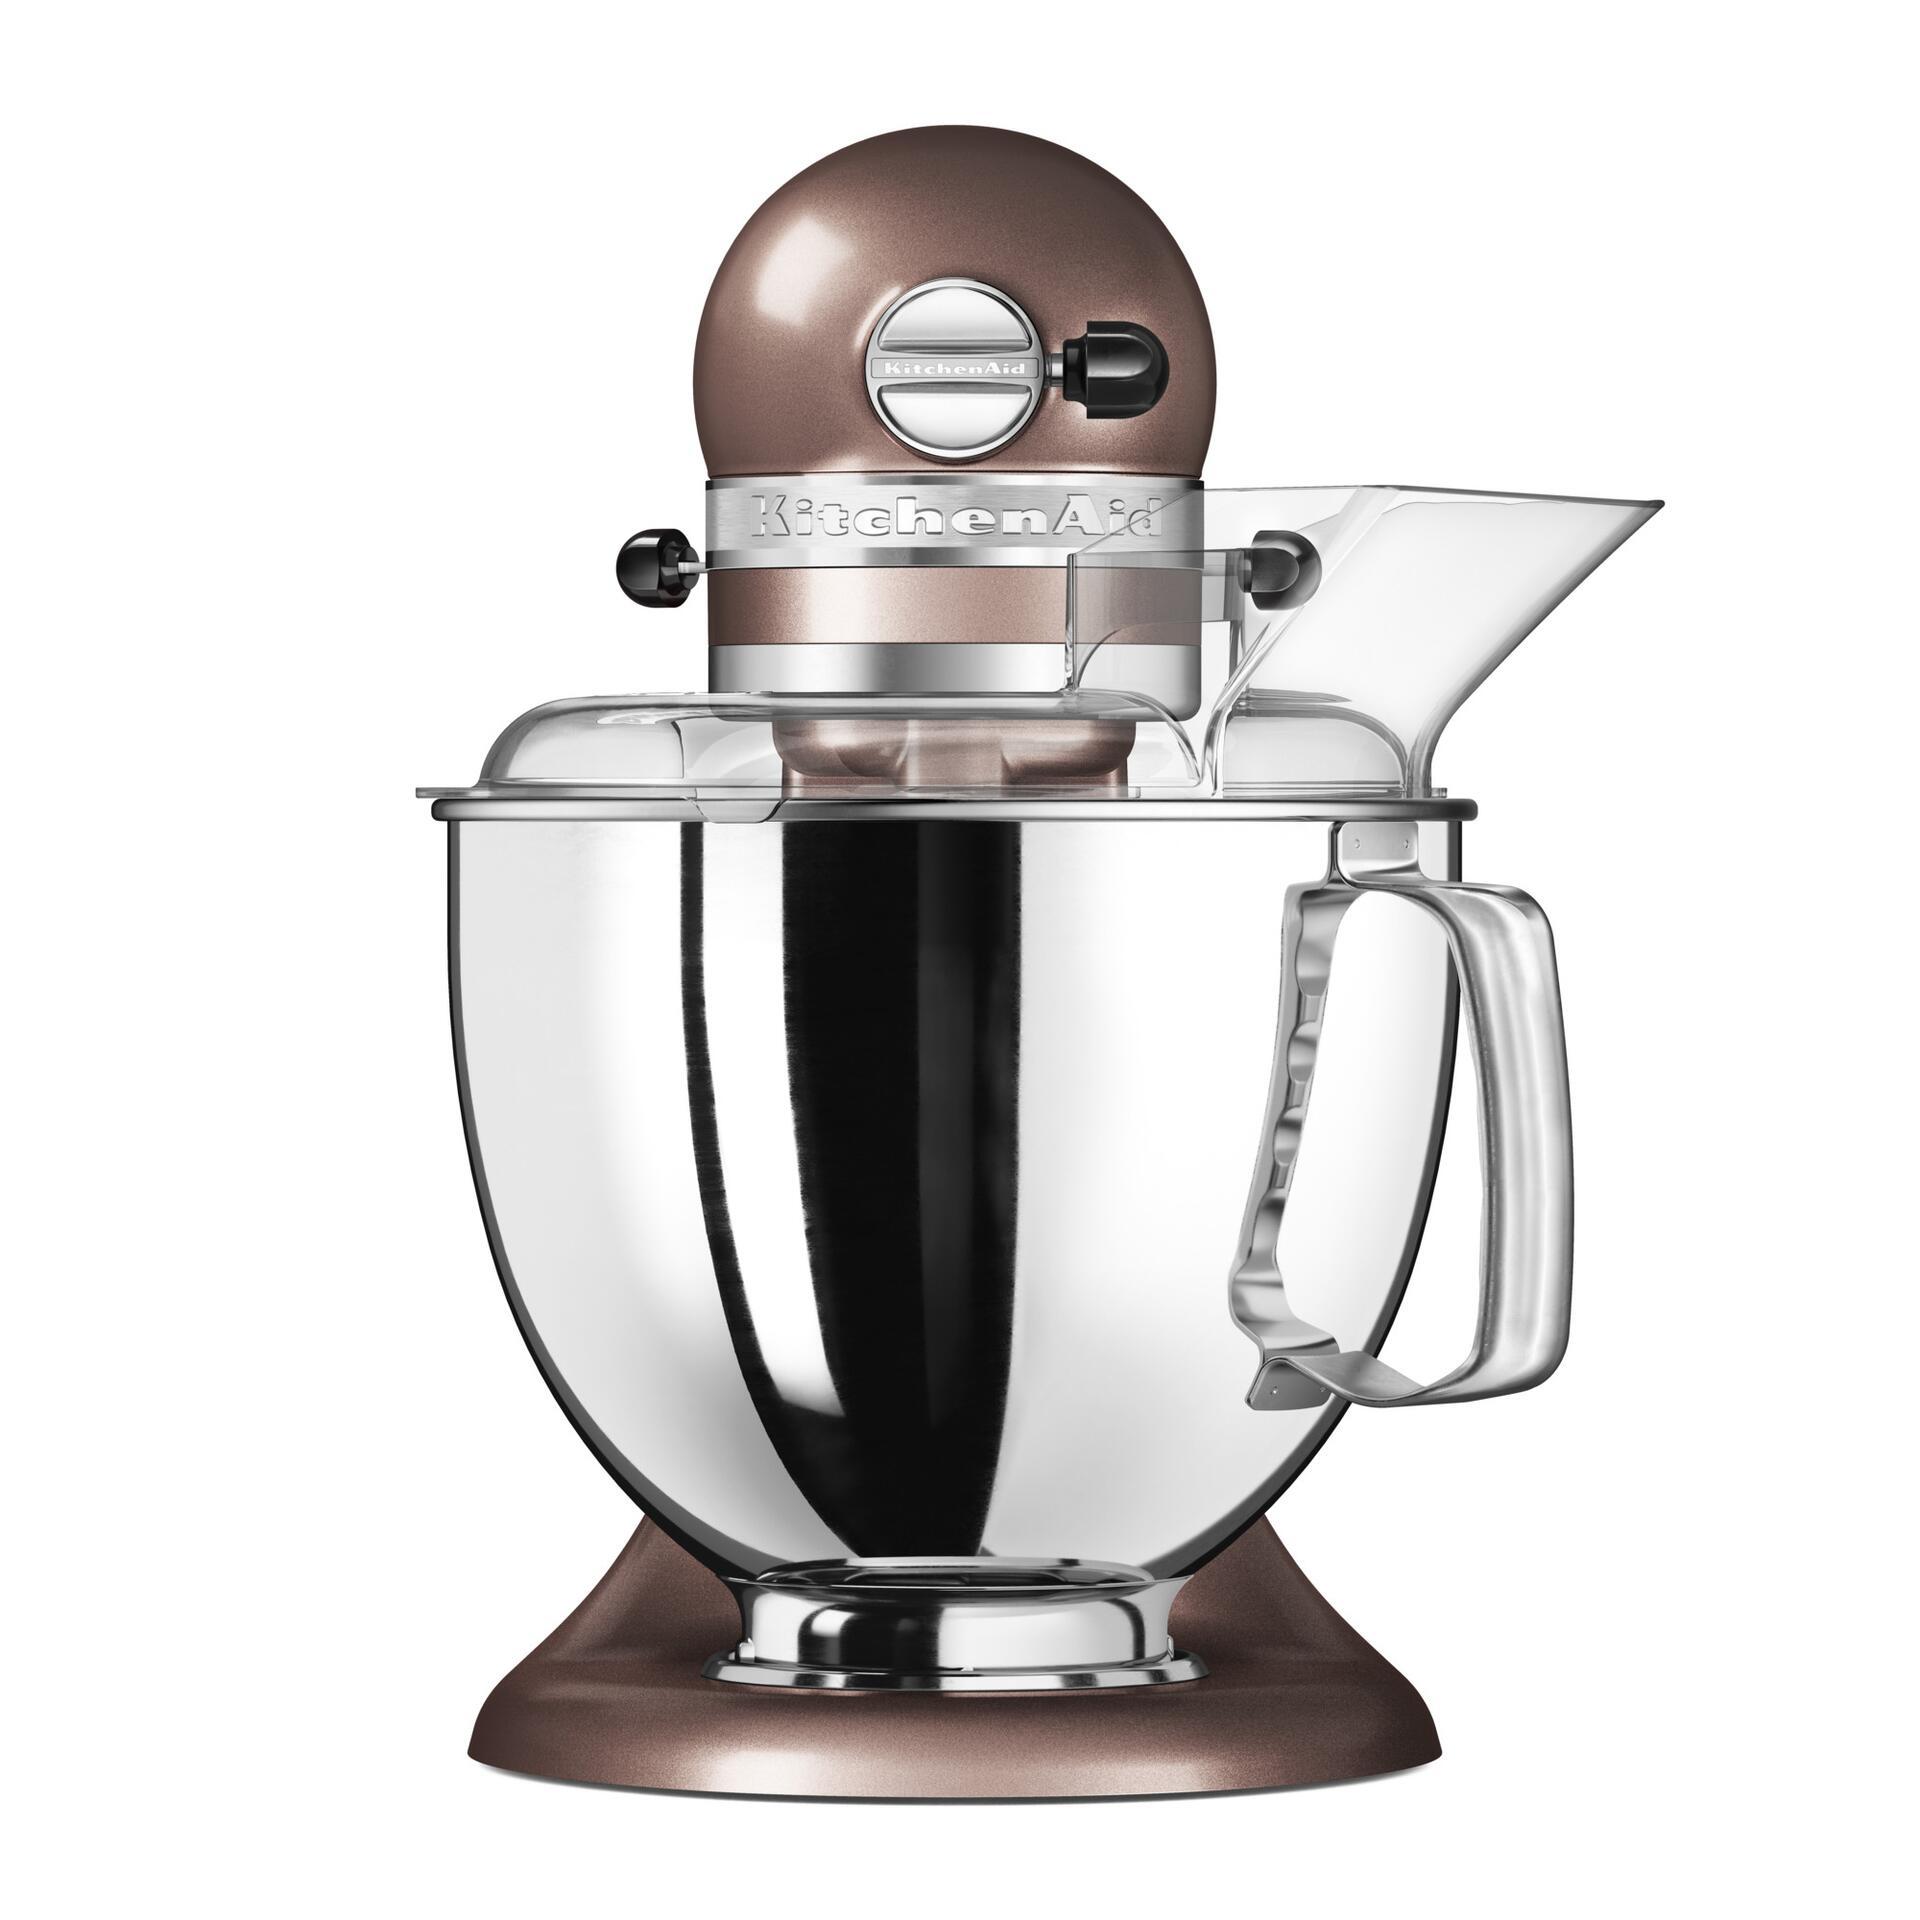 Kitchenaid Küchenmaschine Macadamia 5KSM175PSEAP